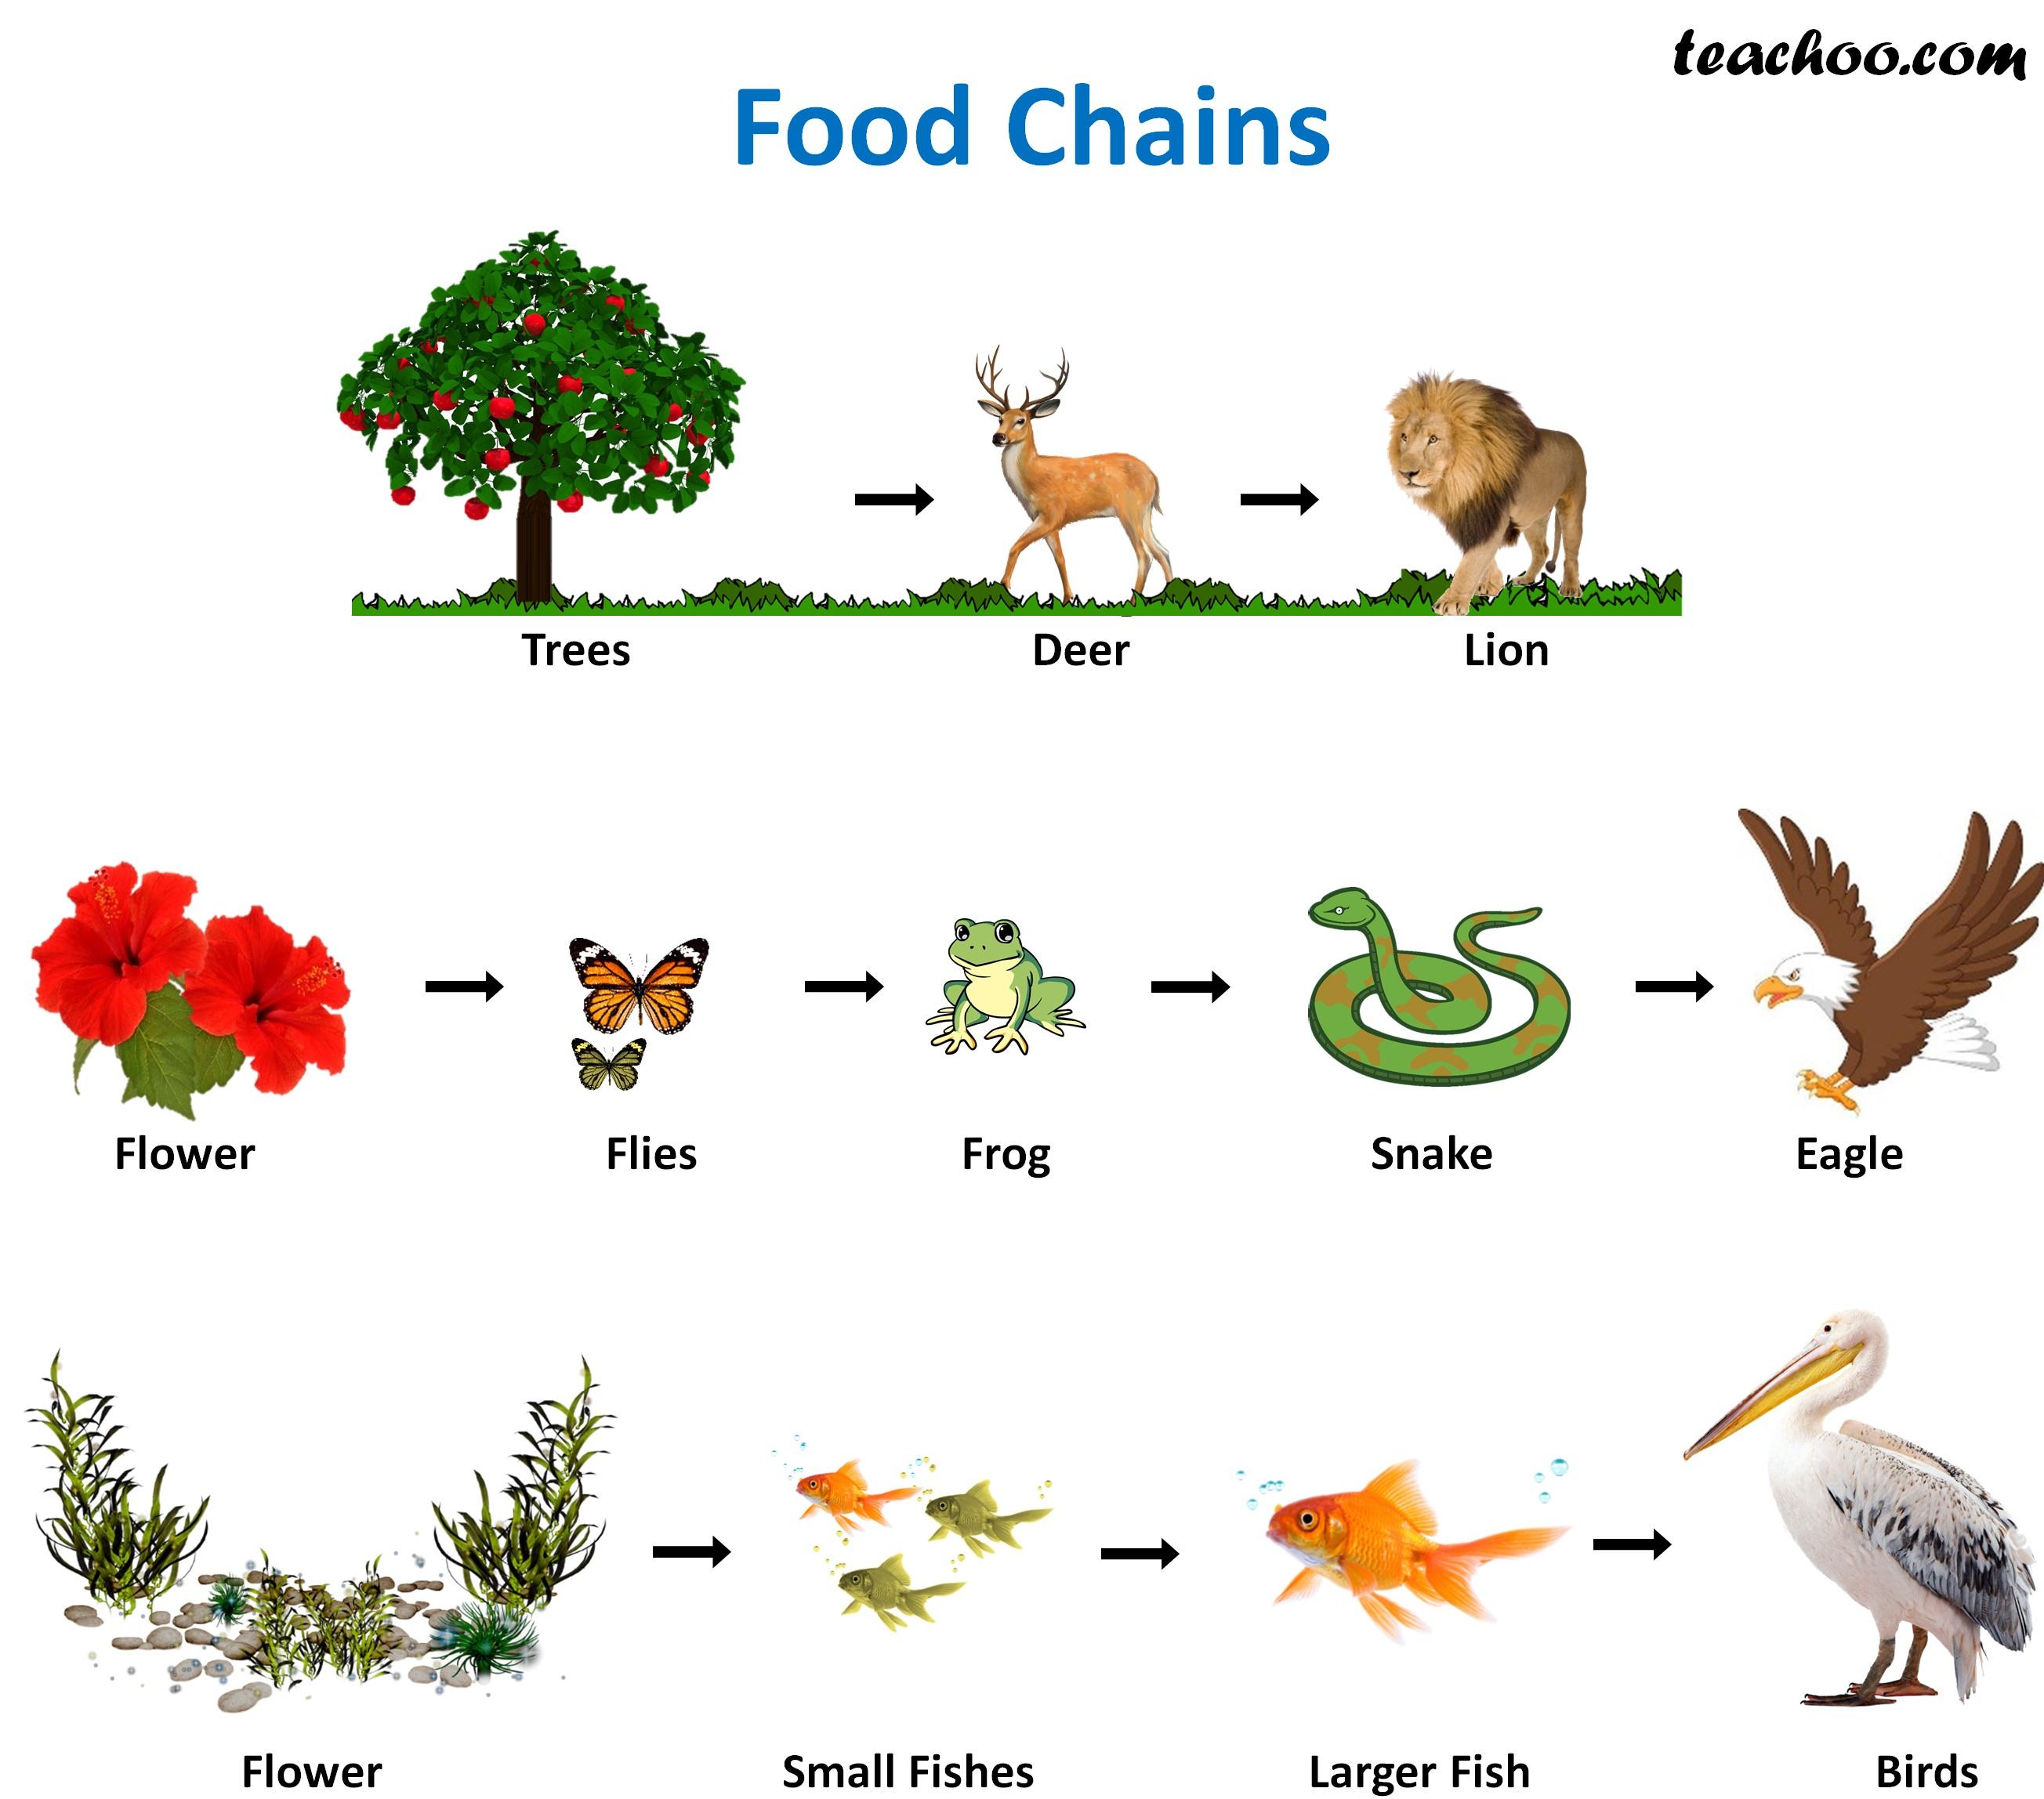 Food Chain And Food Web